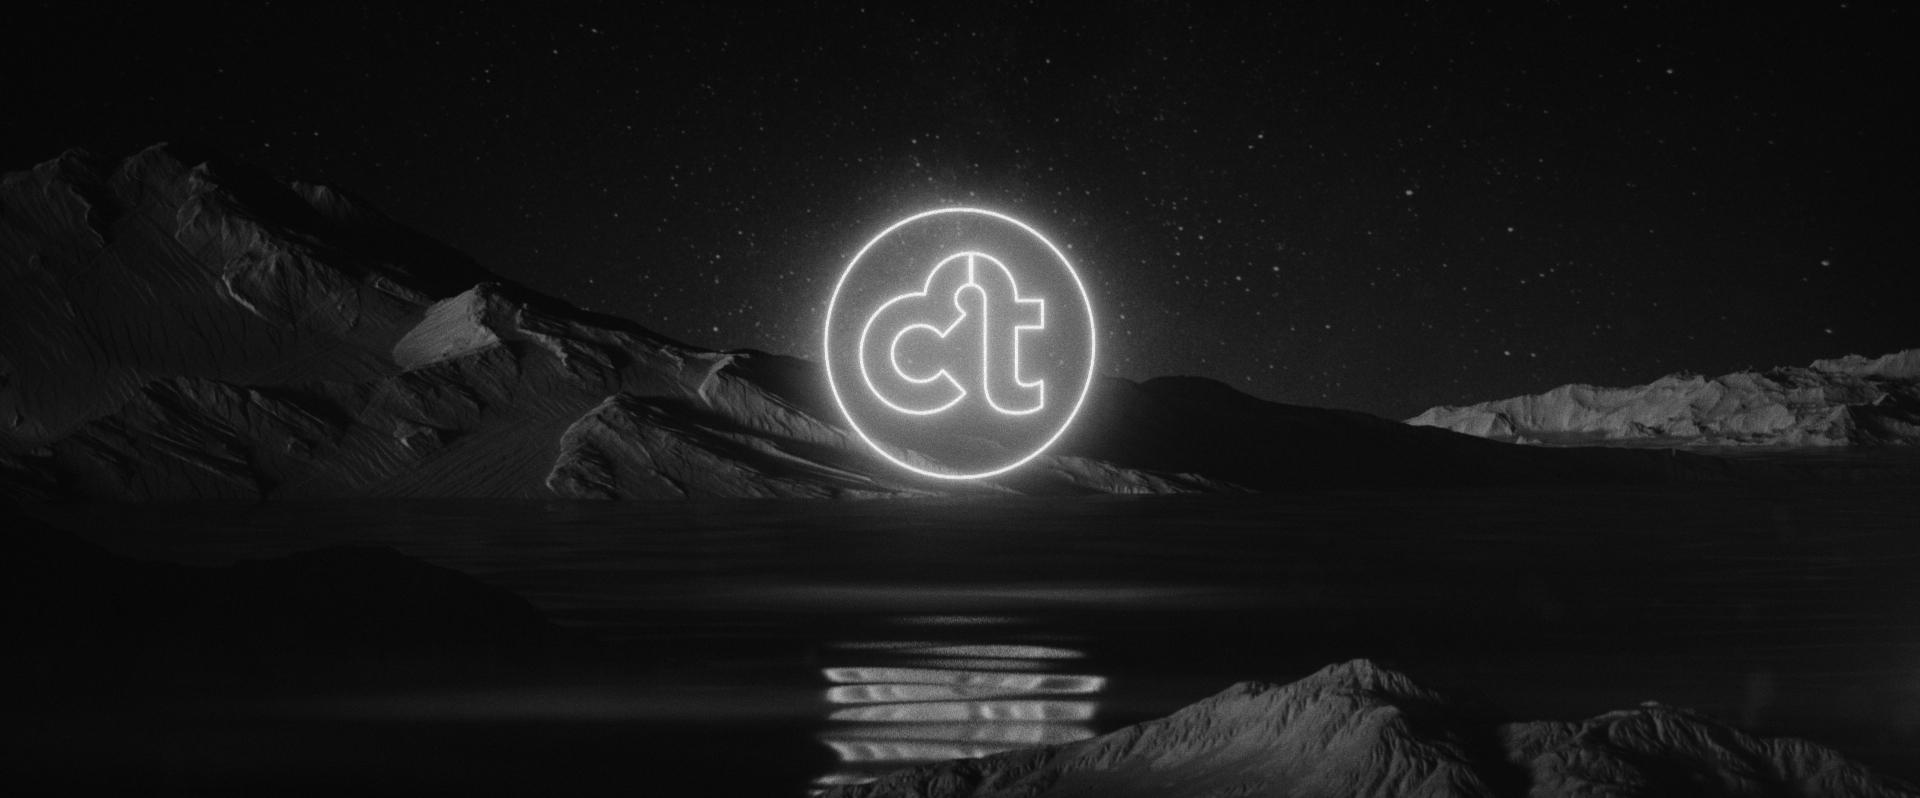 CMTHReel_2018About_new.jpg